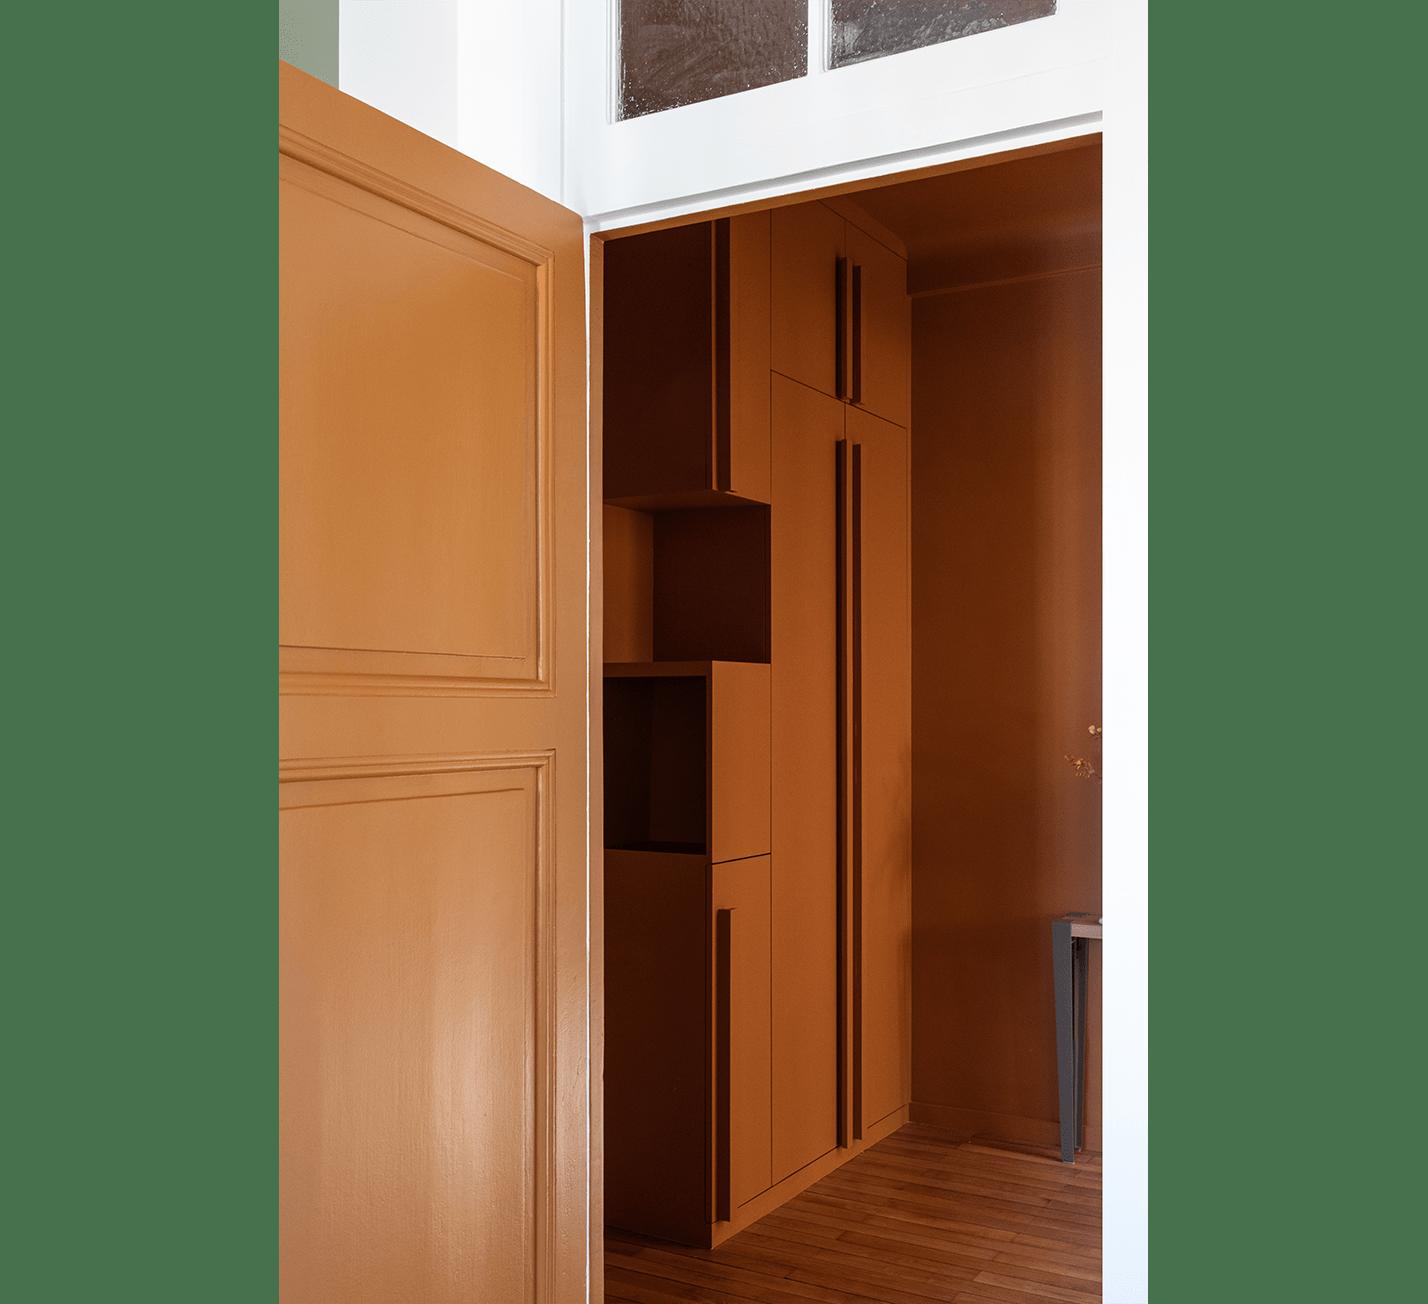 Projet-Emile-Atelier-Steve-Pauline-Borgia-Architecte-interieur-13-min